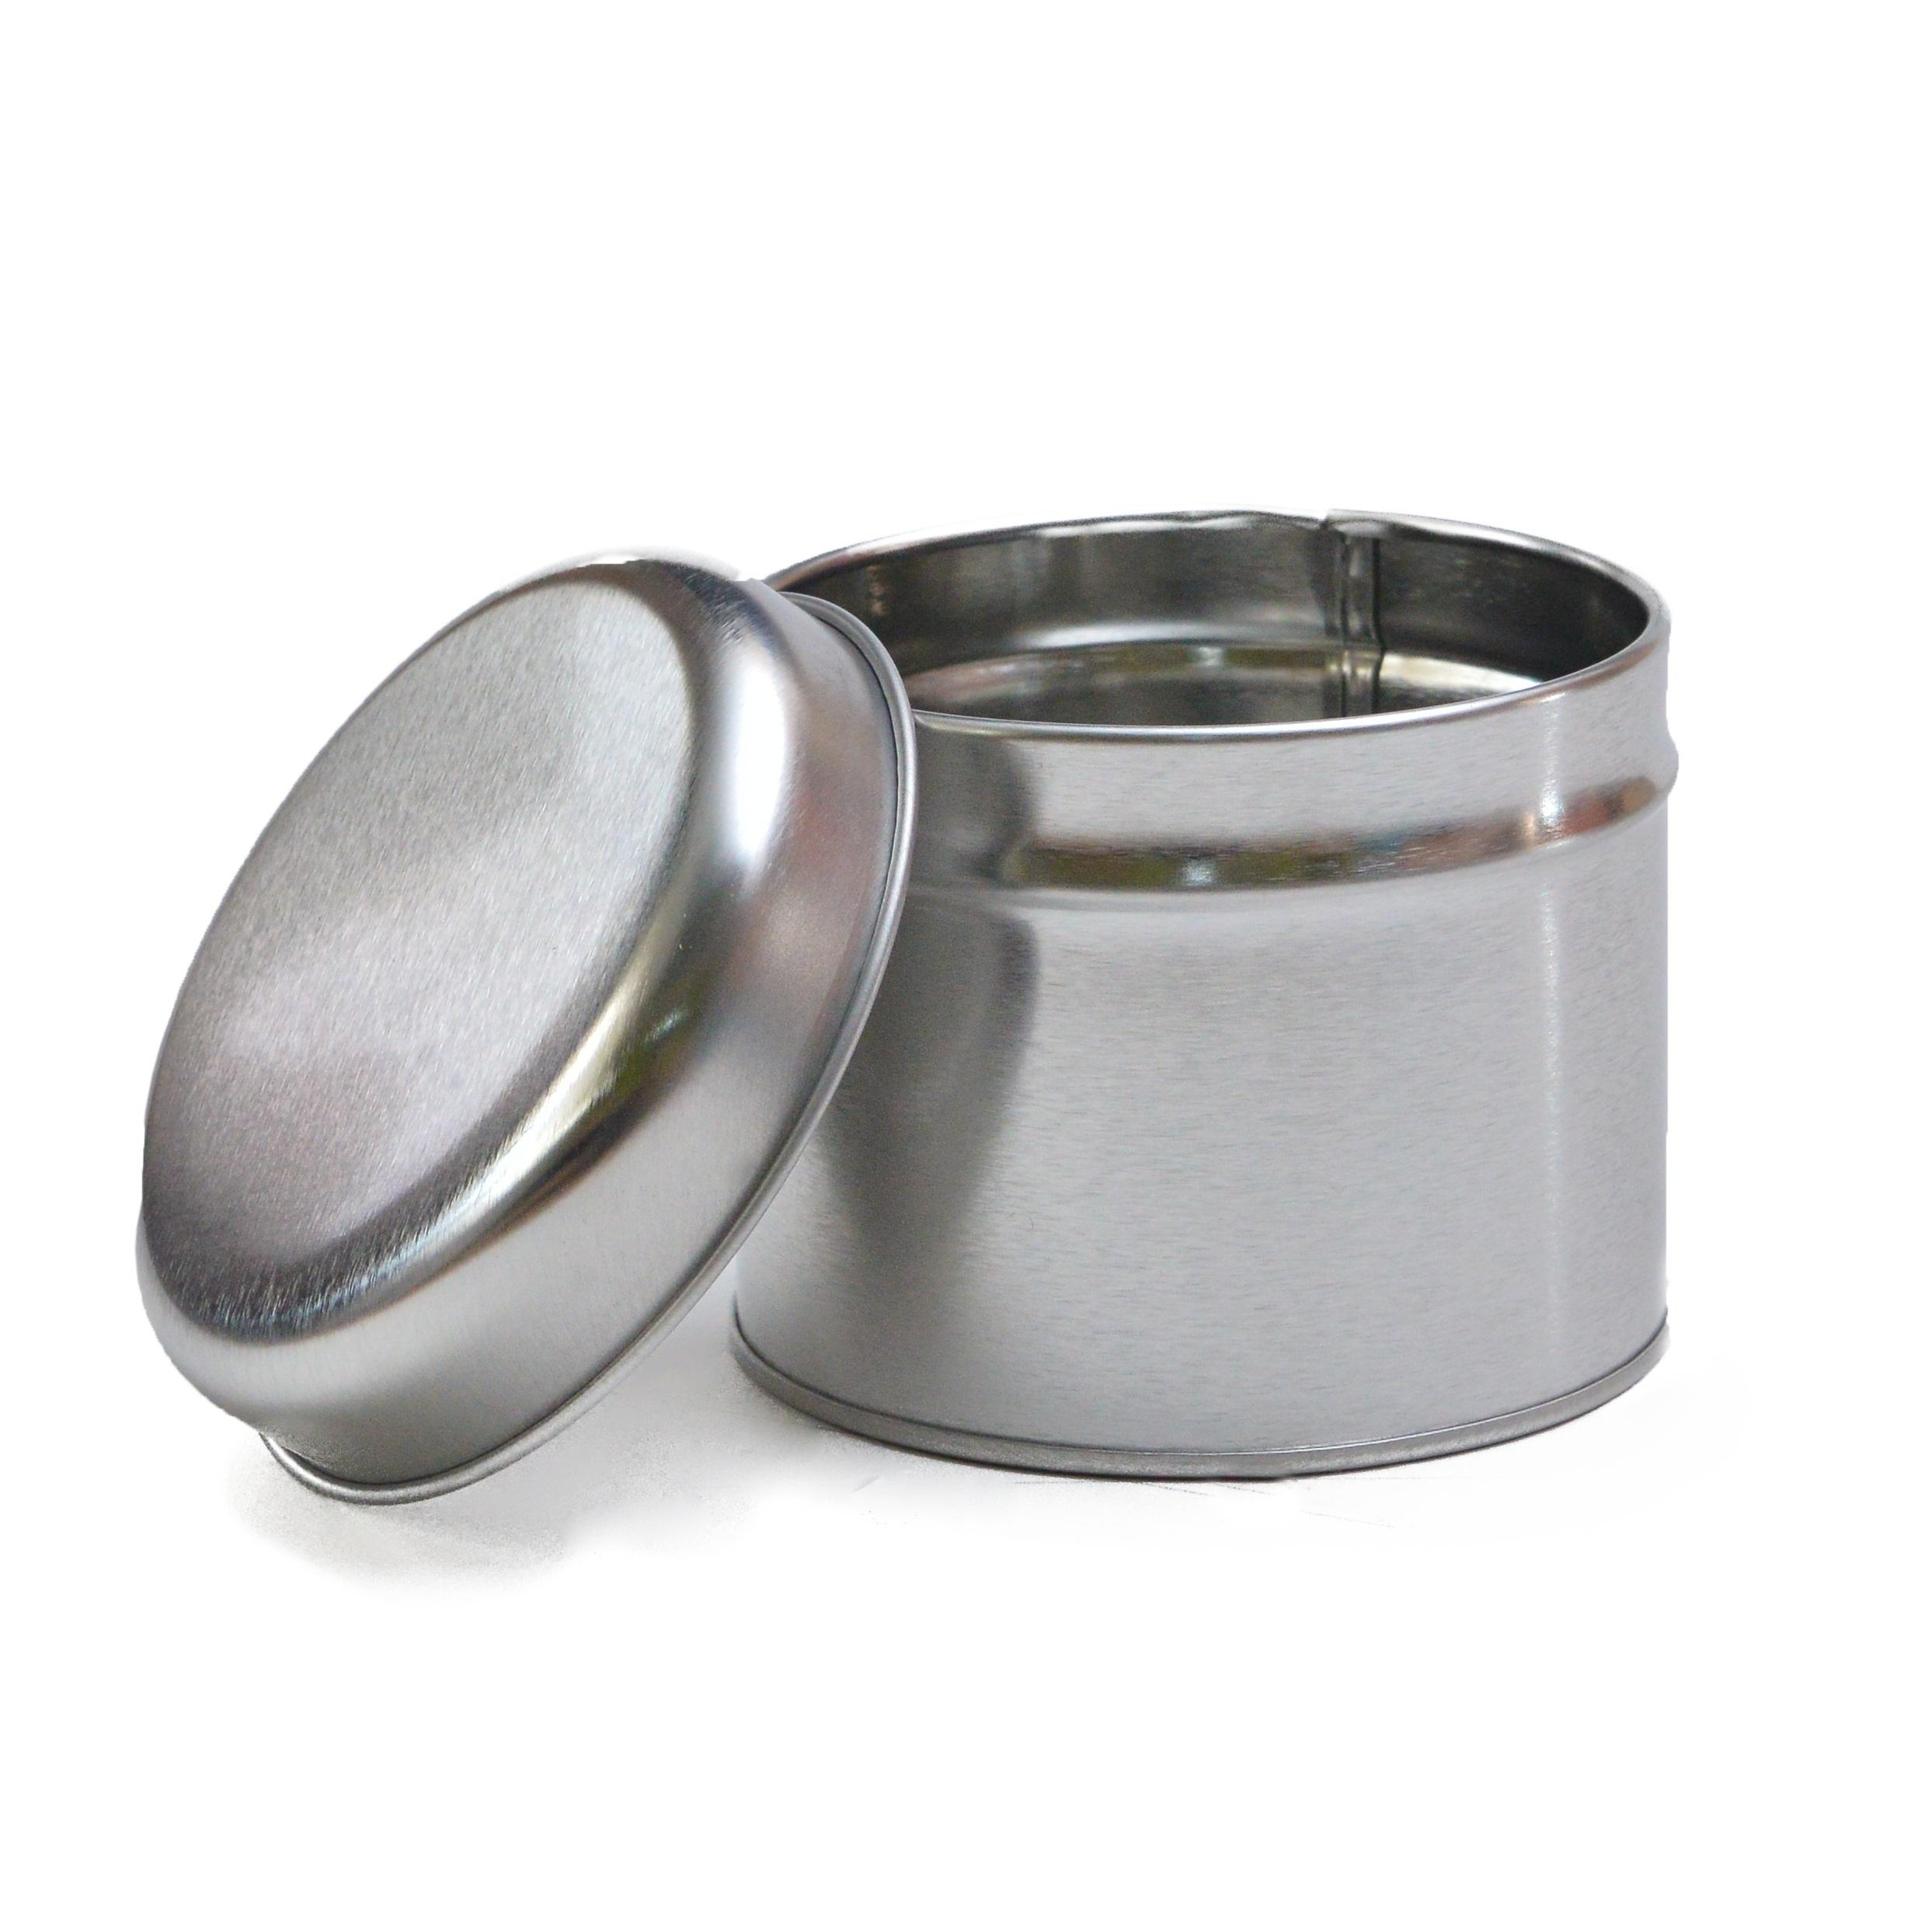 tin lighting. cup metal box lighting material product can tin cookware and bakeware